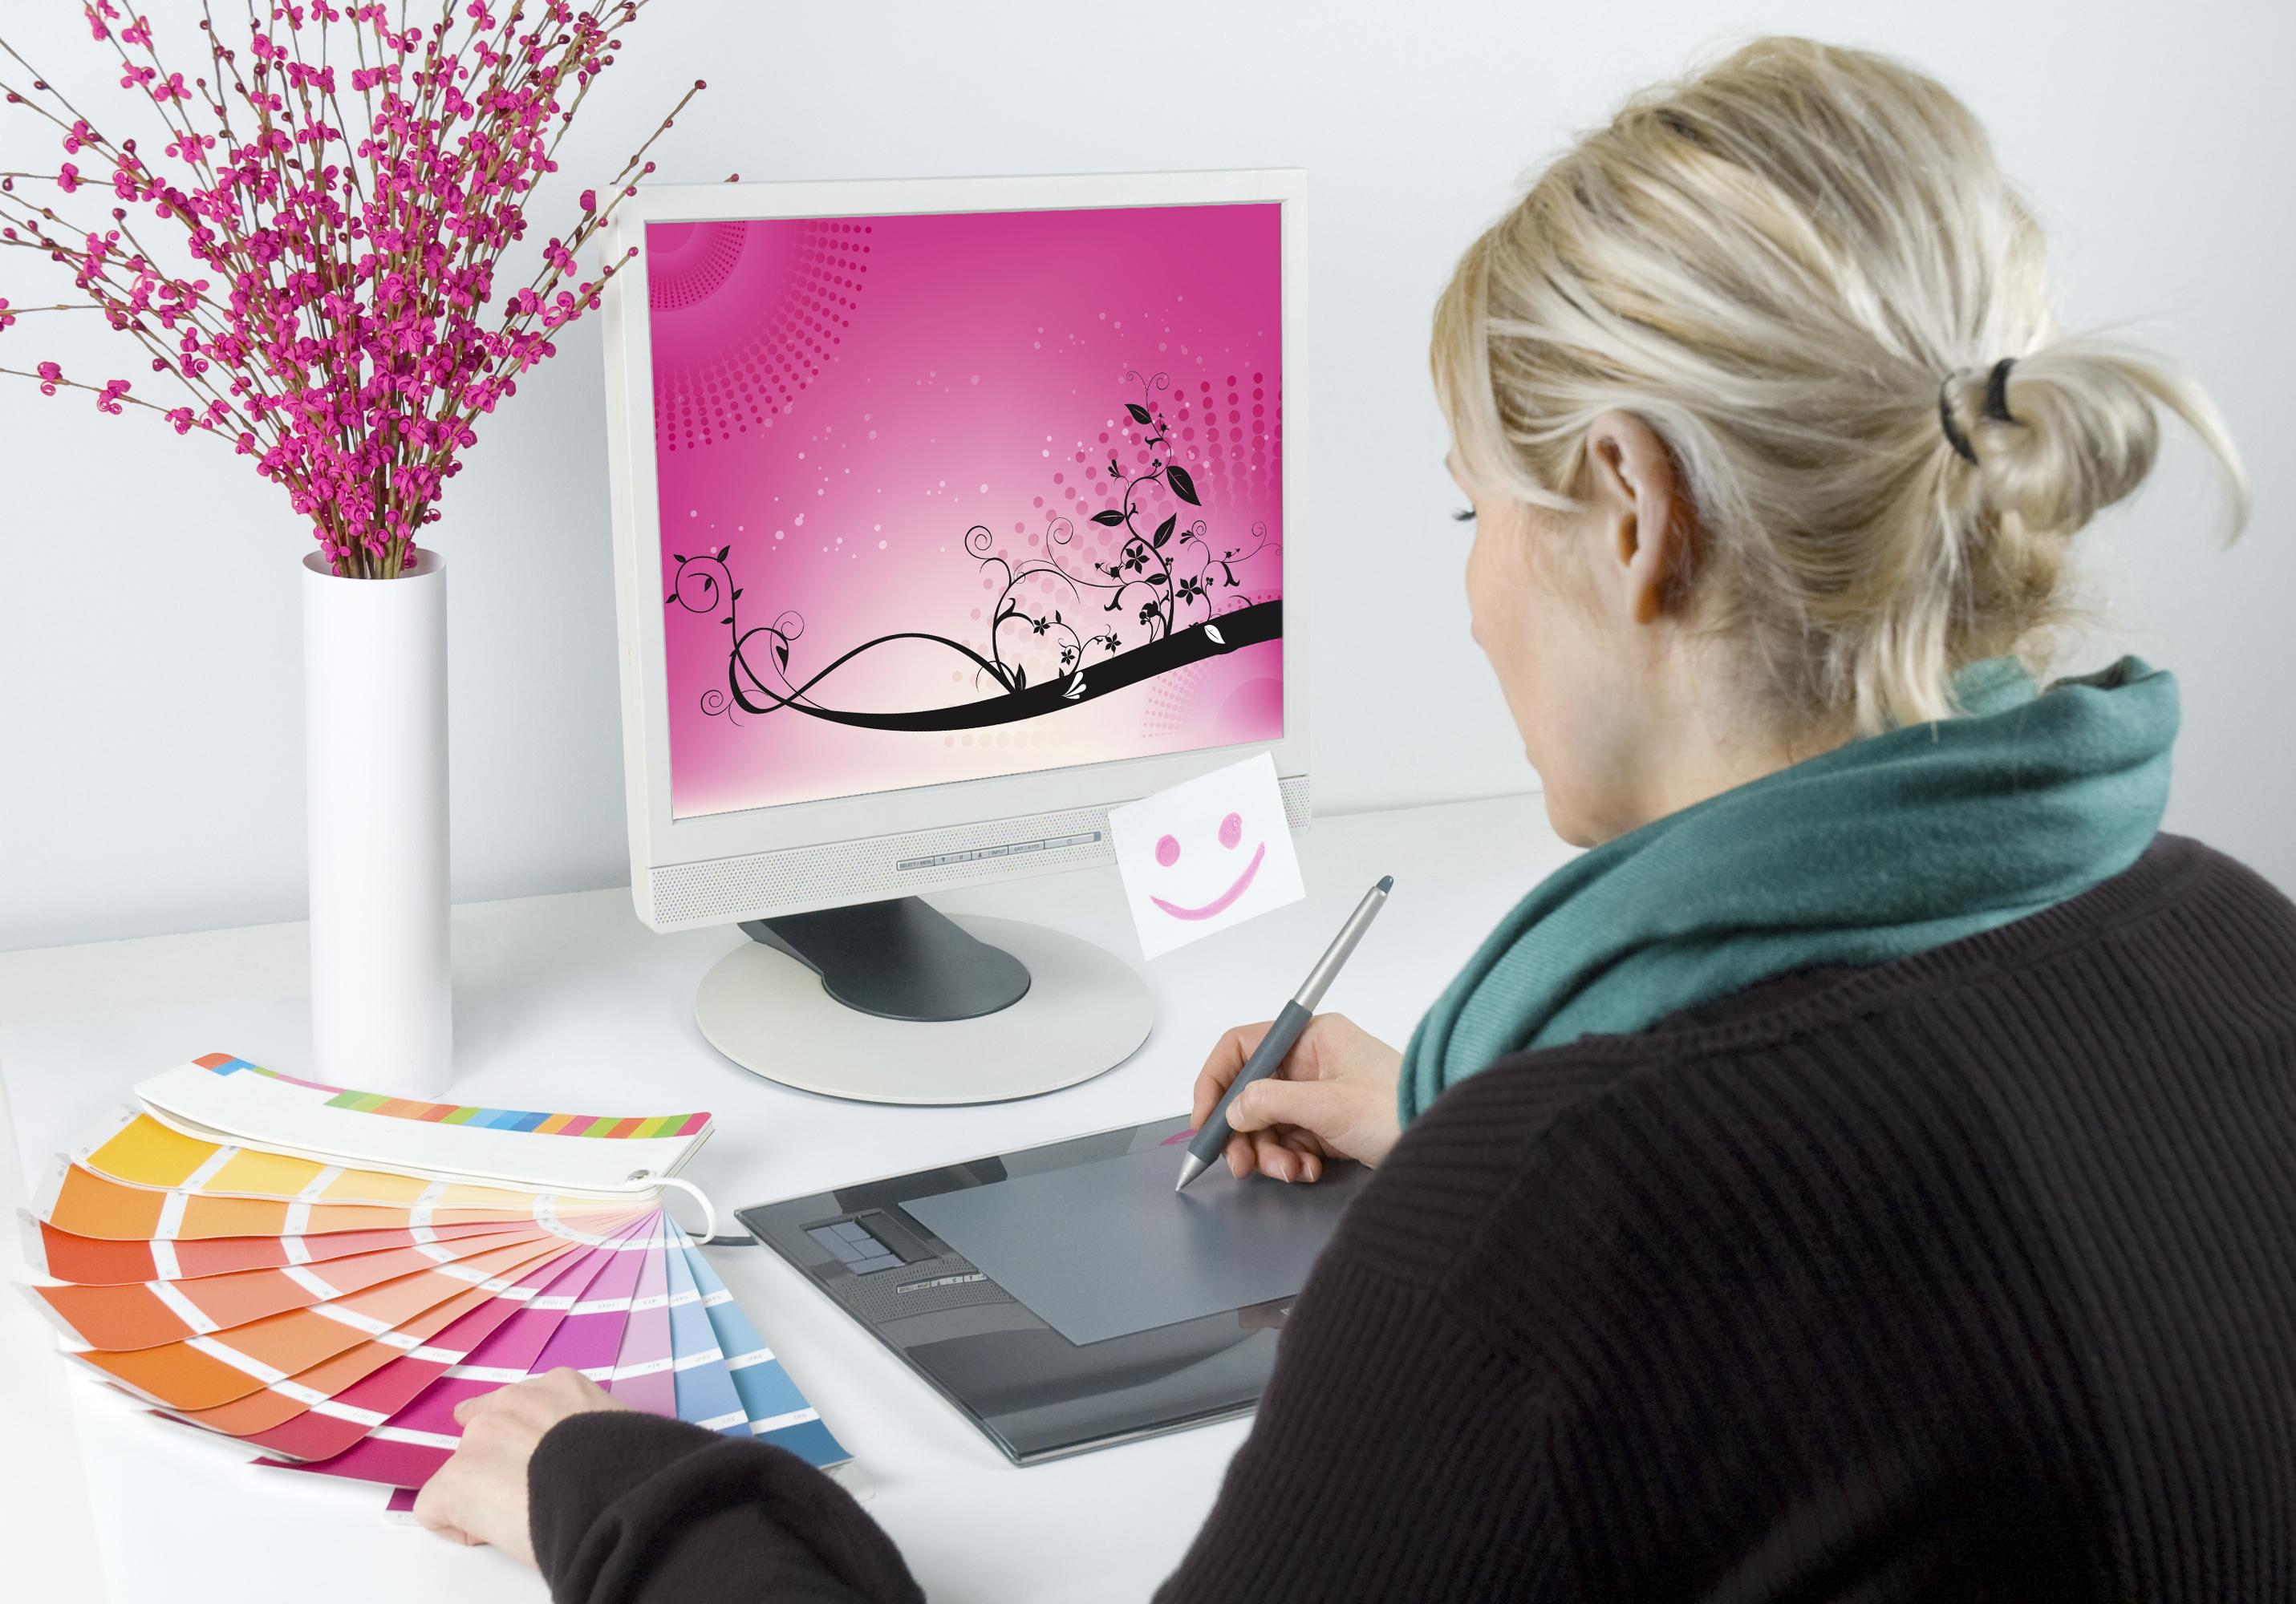 Преподавание графики и дизайна